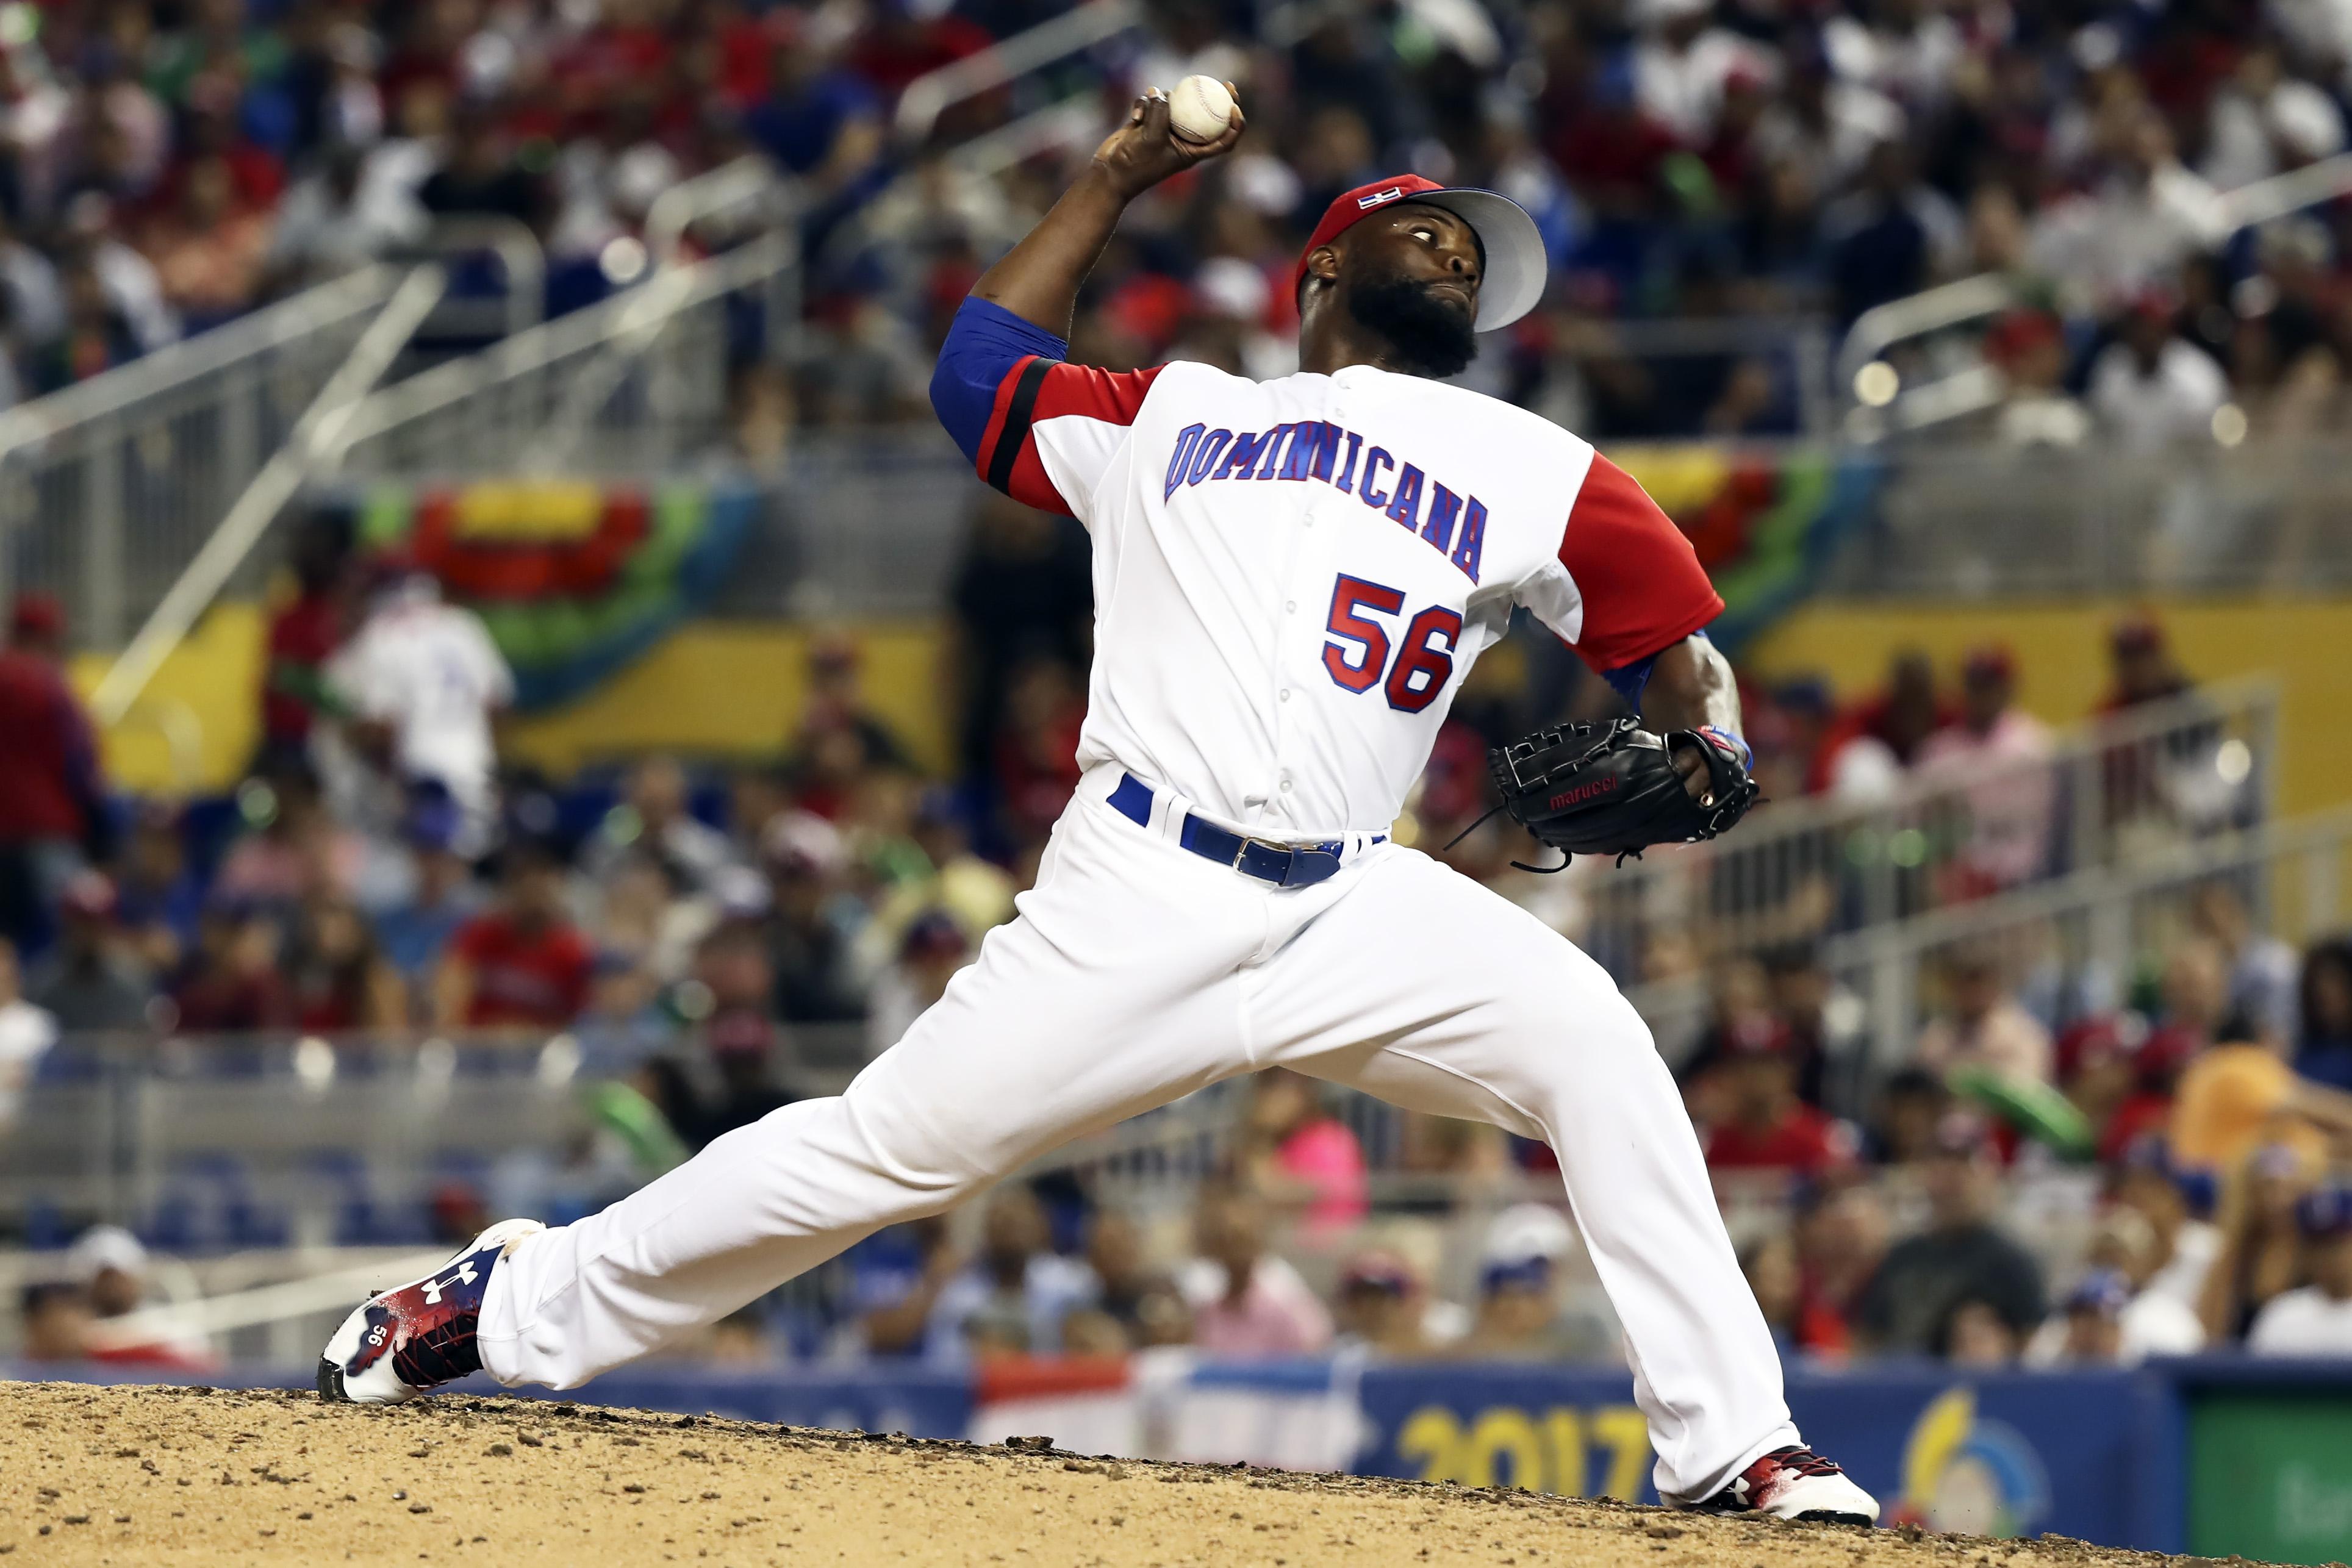 9928794-baseball-world-baseball-classic-canada-at-dominican-republic